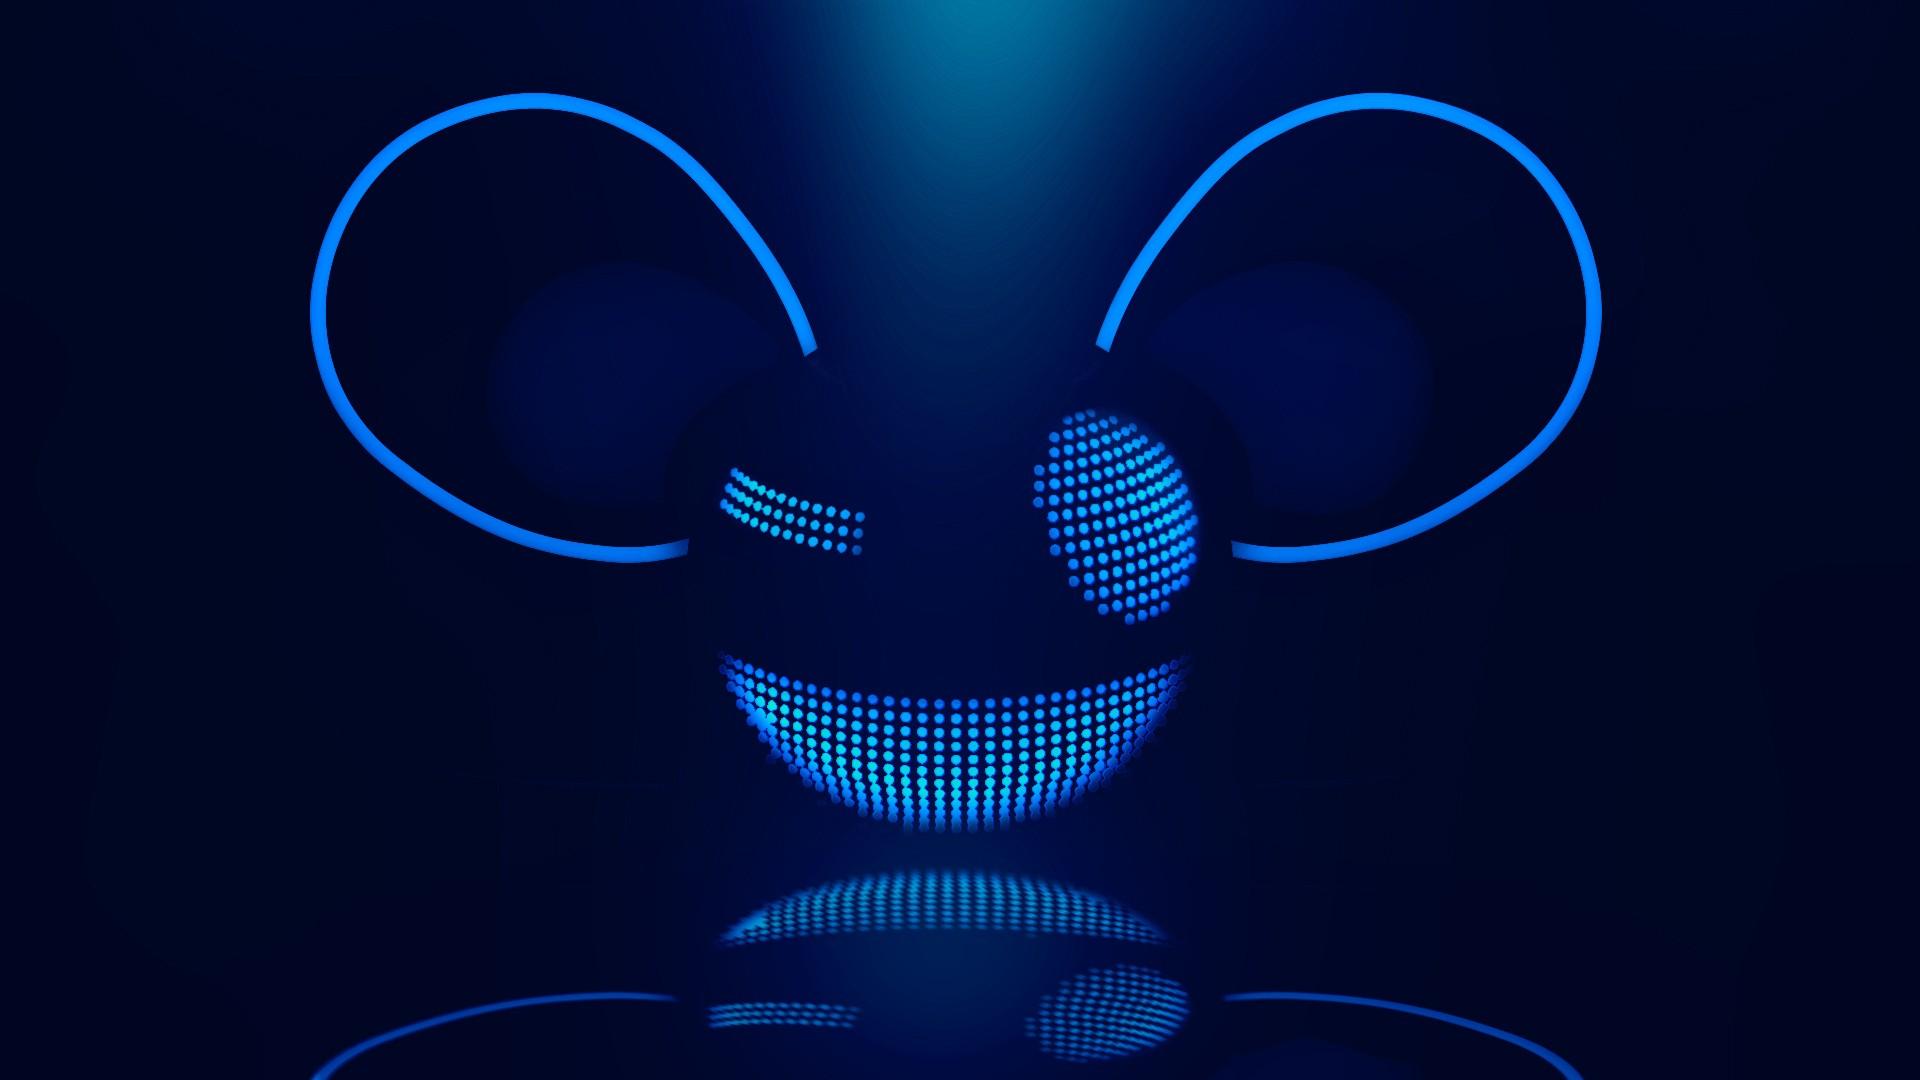 Blue Music Wallpaper 1920x1080 Blue Music Deadmau5 Logos DJ 1920x1080